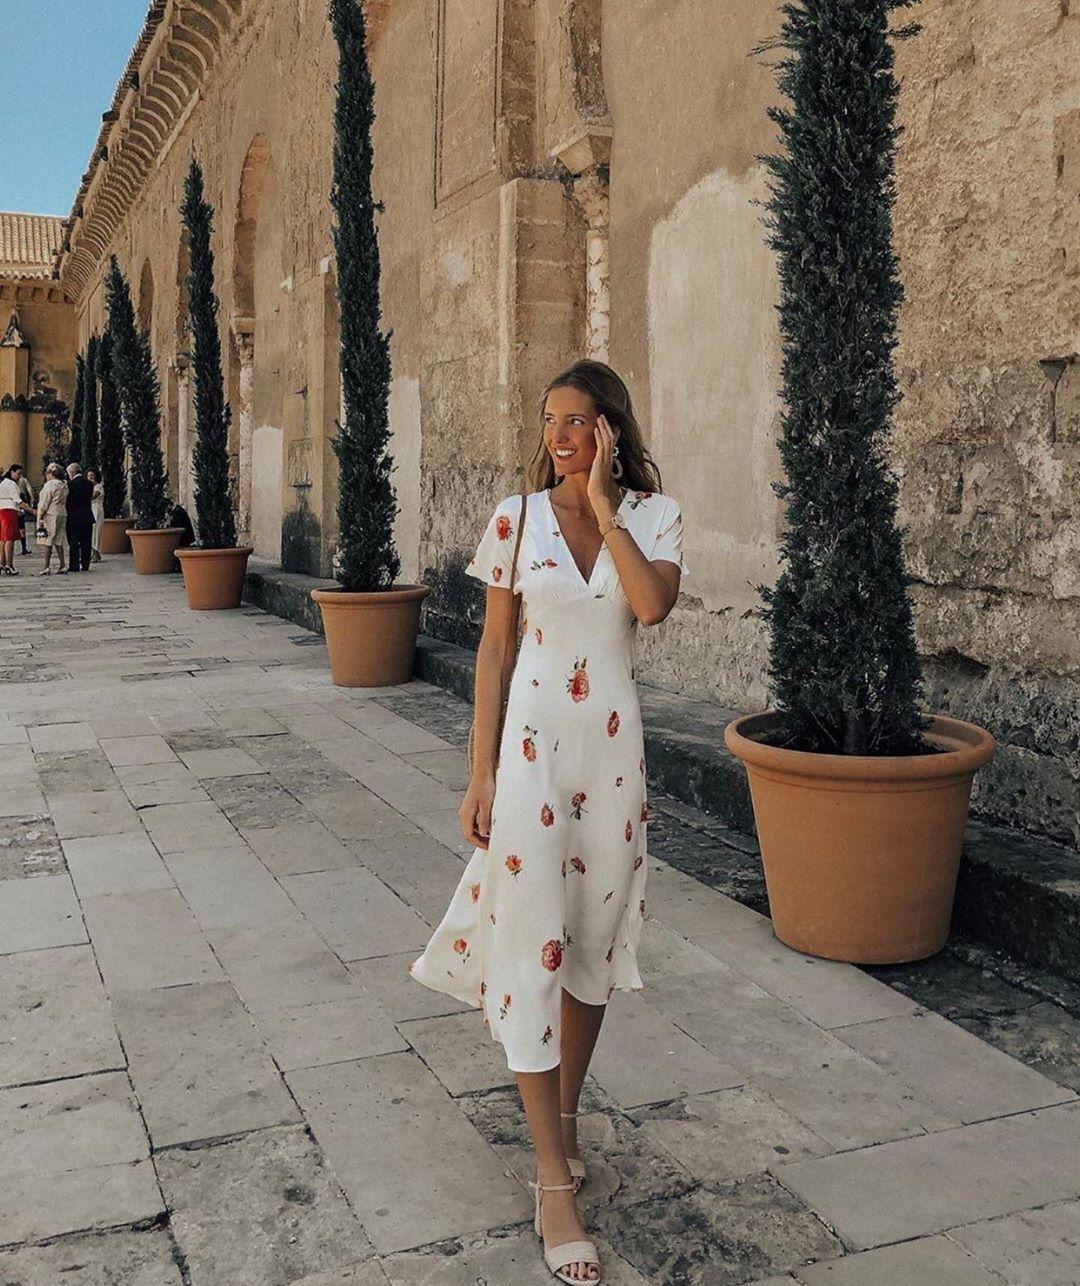 printed dress de Zara sur zaraaddiction